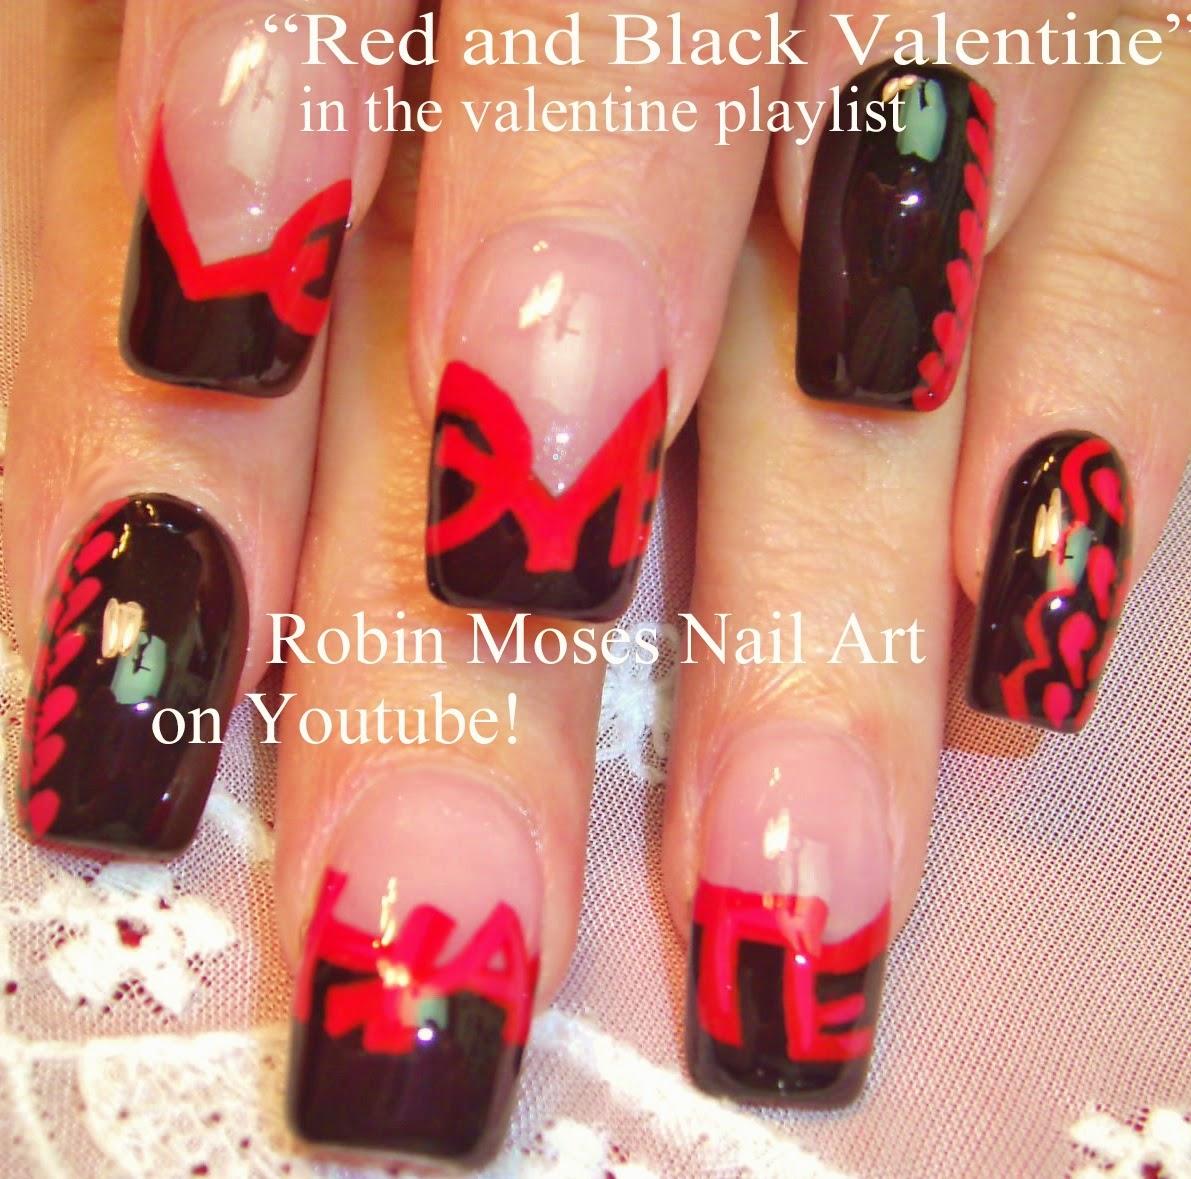 Robin moses nail art cupid nails valentines day nails heart cupid nails valentines day nails heart nails ekg nails black lace nails black hearts black heart nails anti valentine i hate valentines prinsesfo Images